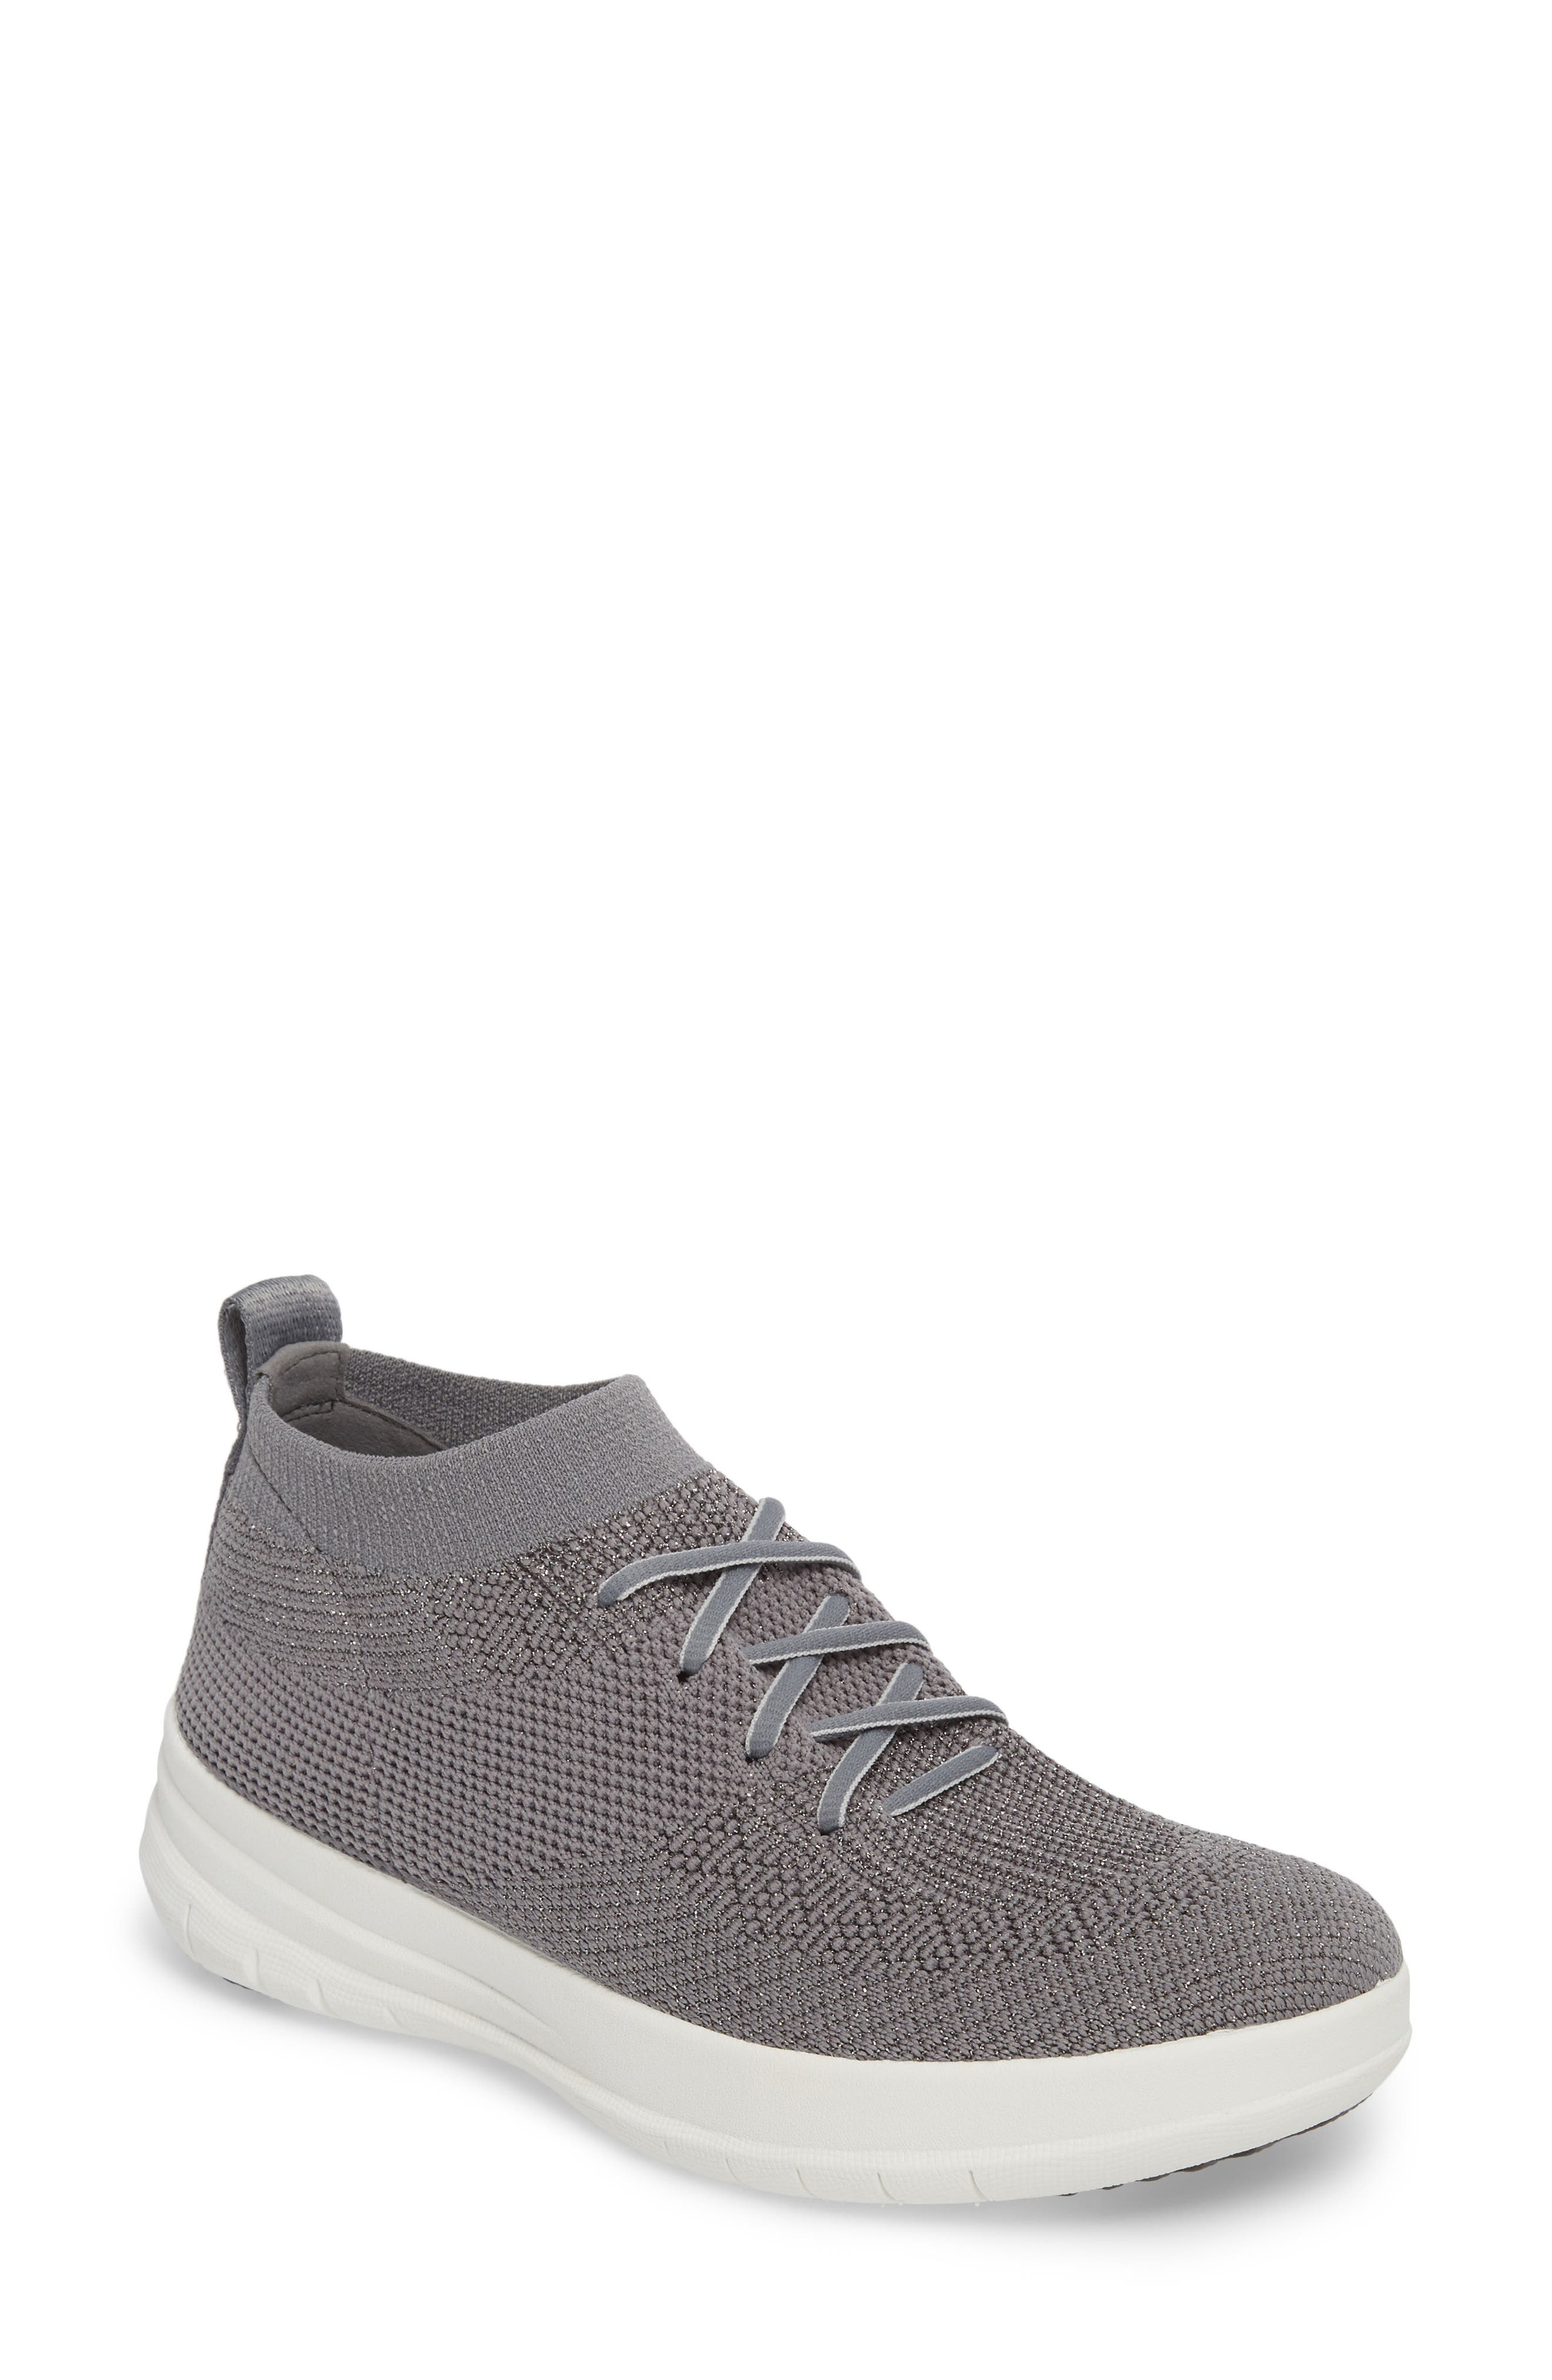 Uberknit<sup>™</sup> Slip-On High-Top Sneaker,                             Main thumbnail 1, color,                             Charcoal/ Metallic Pewter